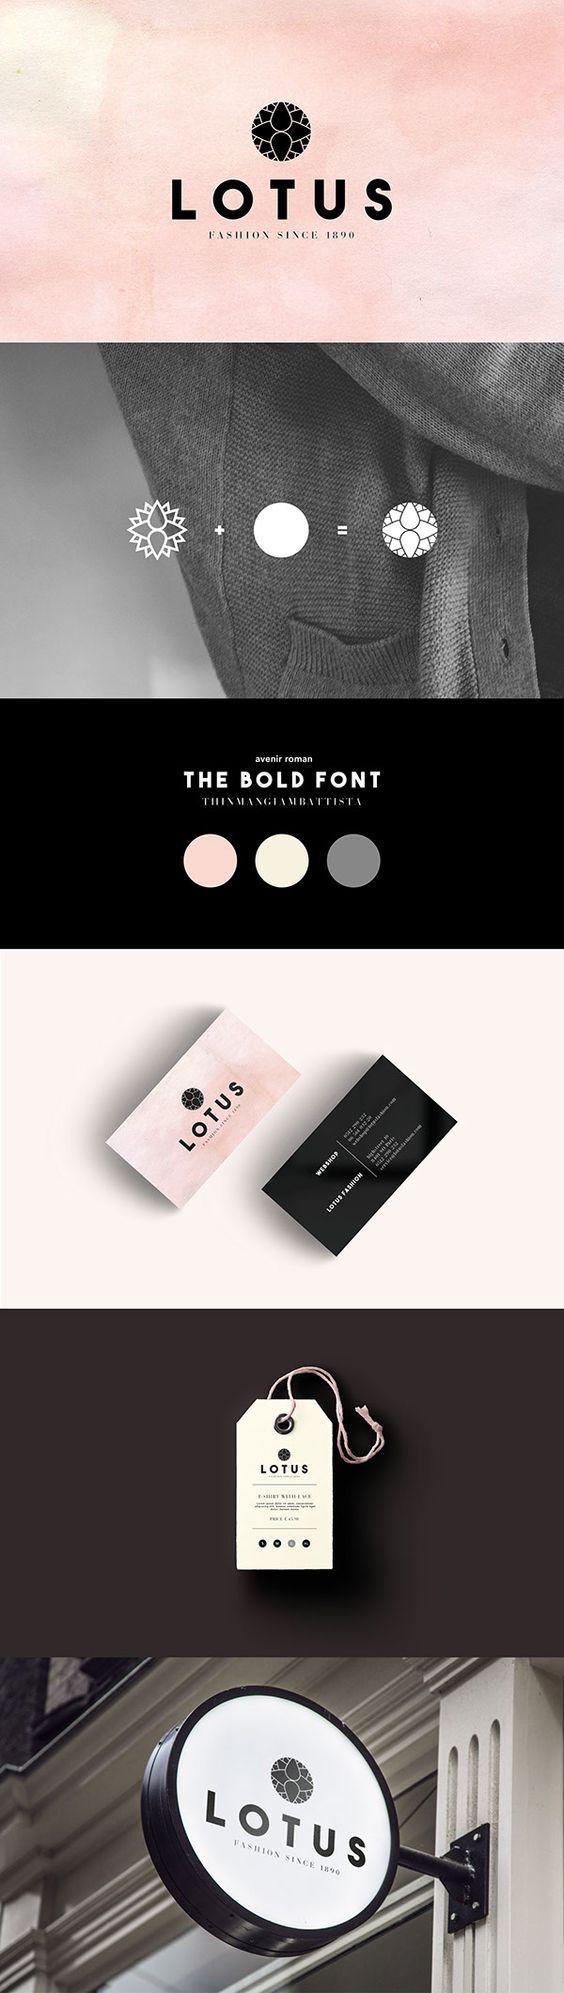 Lotus Branding on Behance